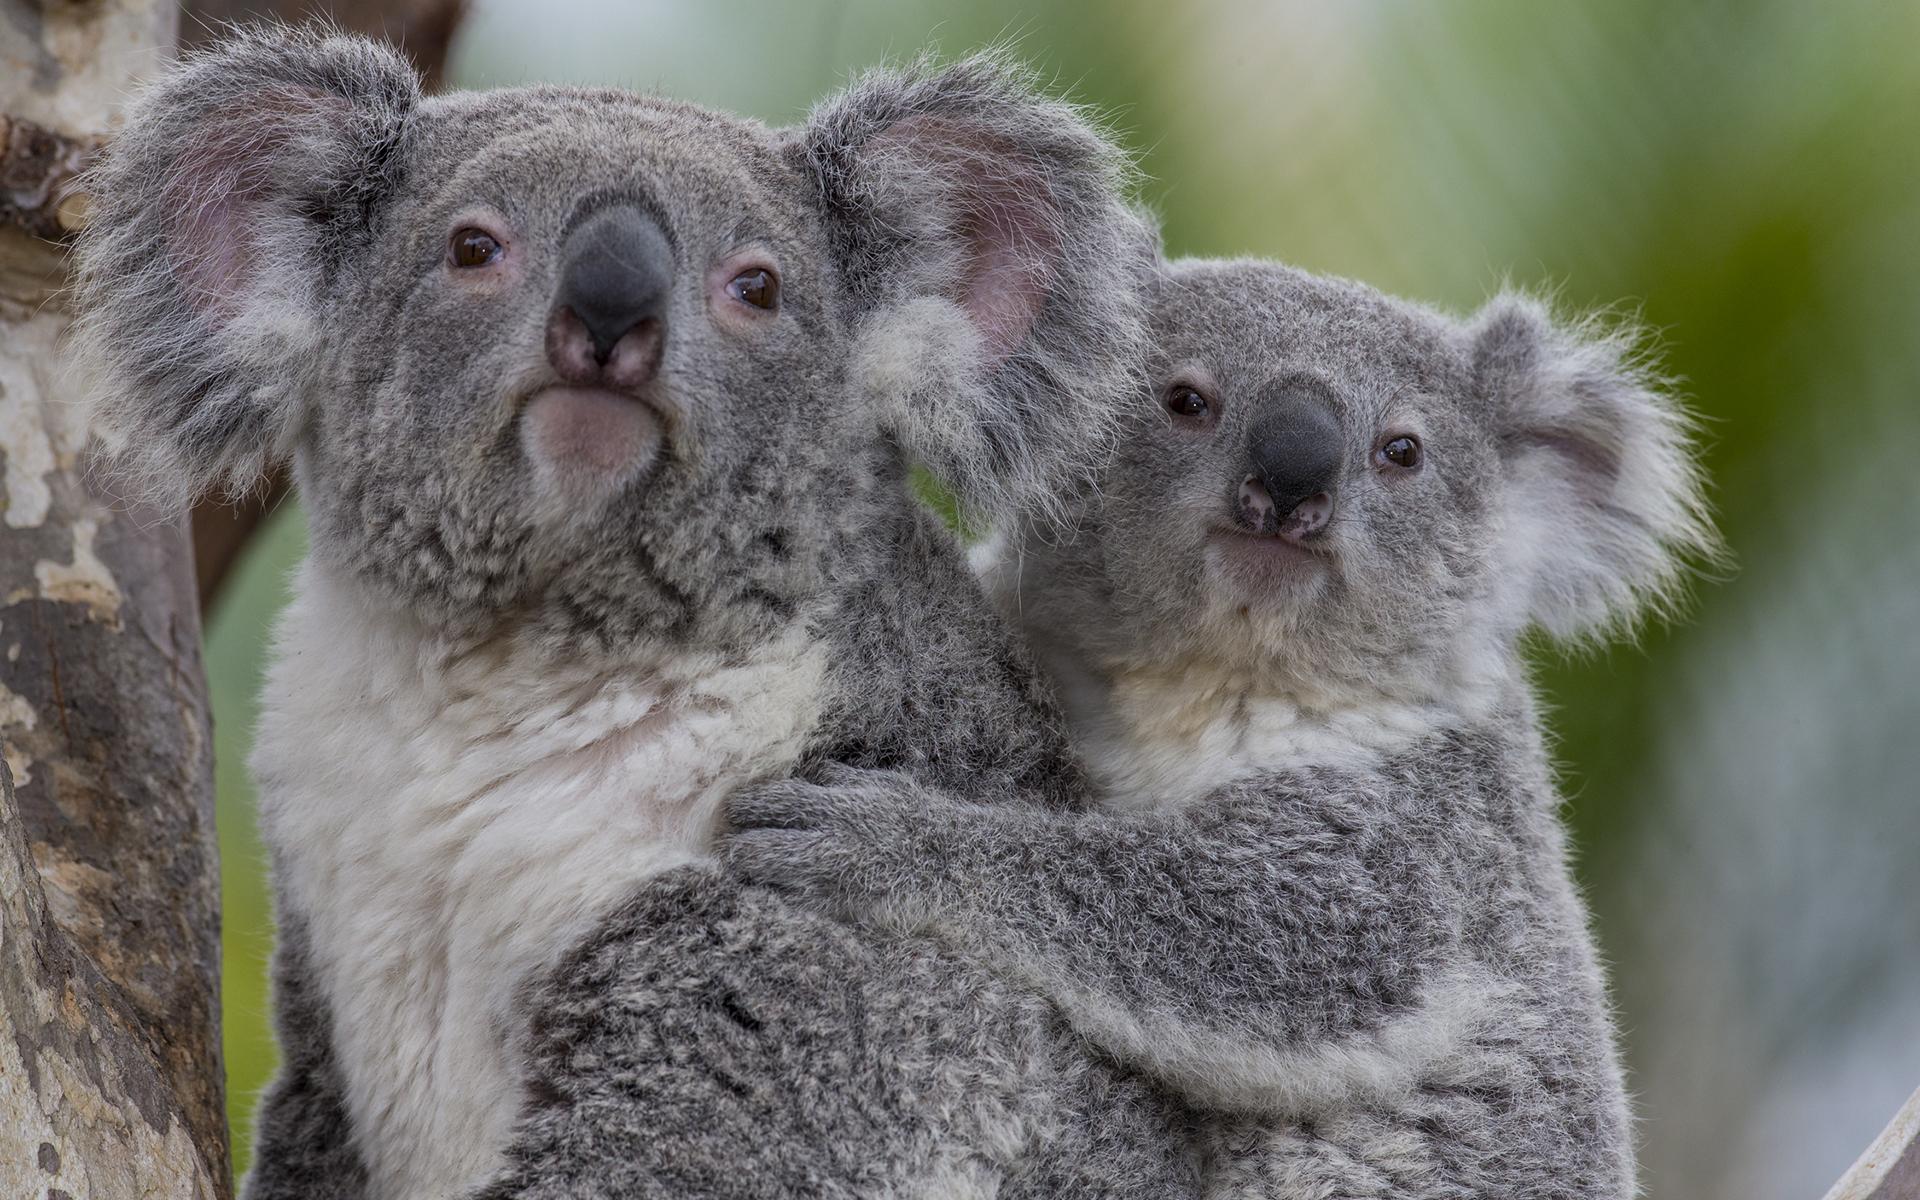 [48+] Baby Koala Wallpaper on WallpaperSafari